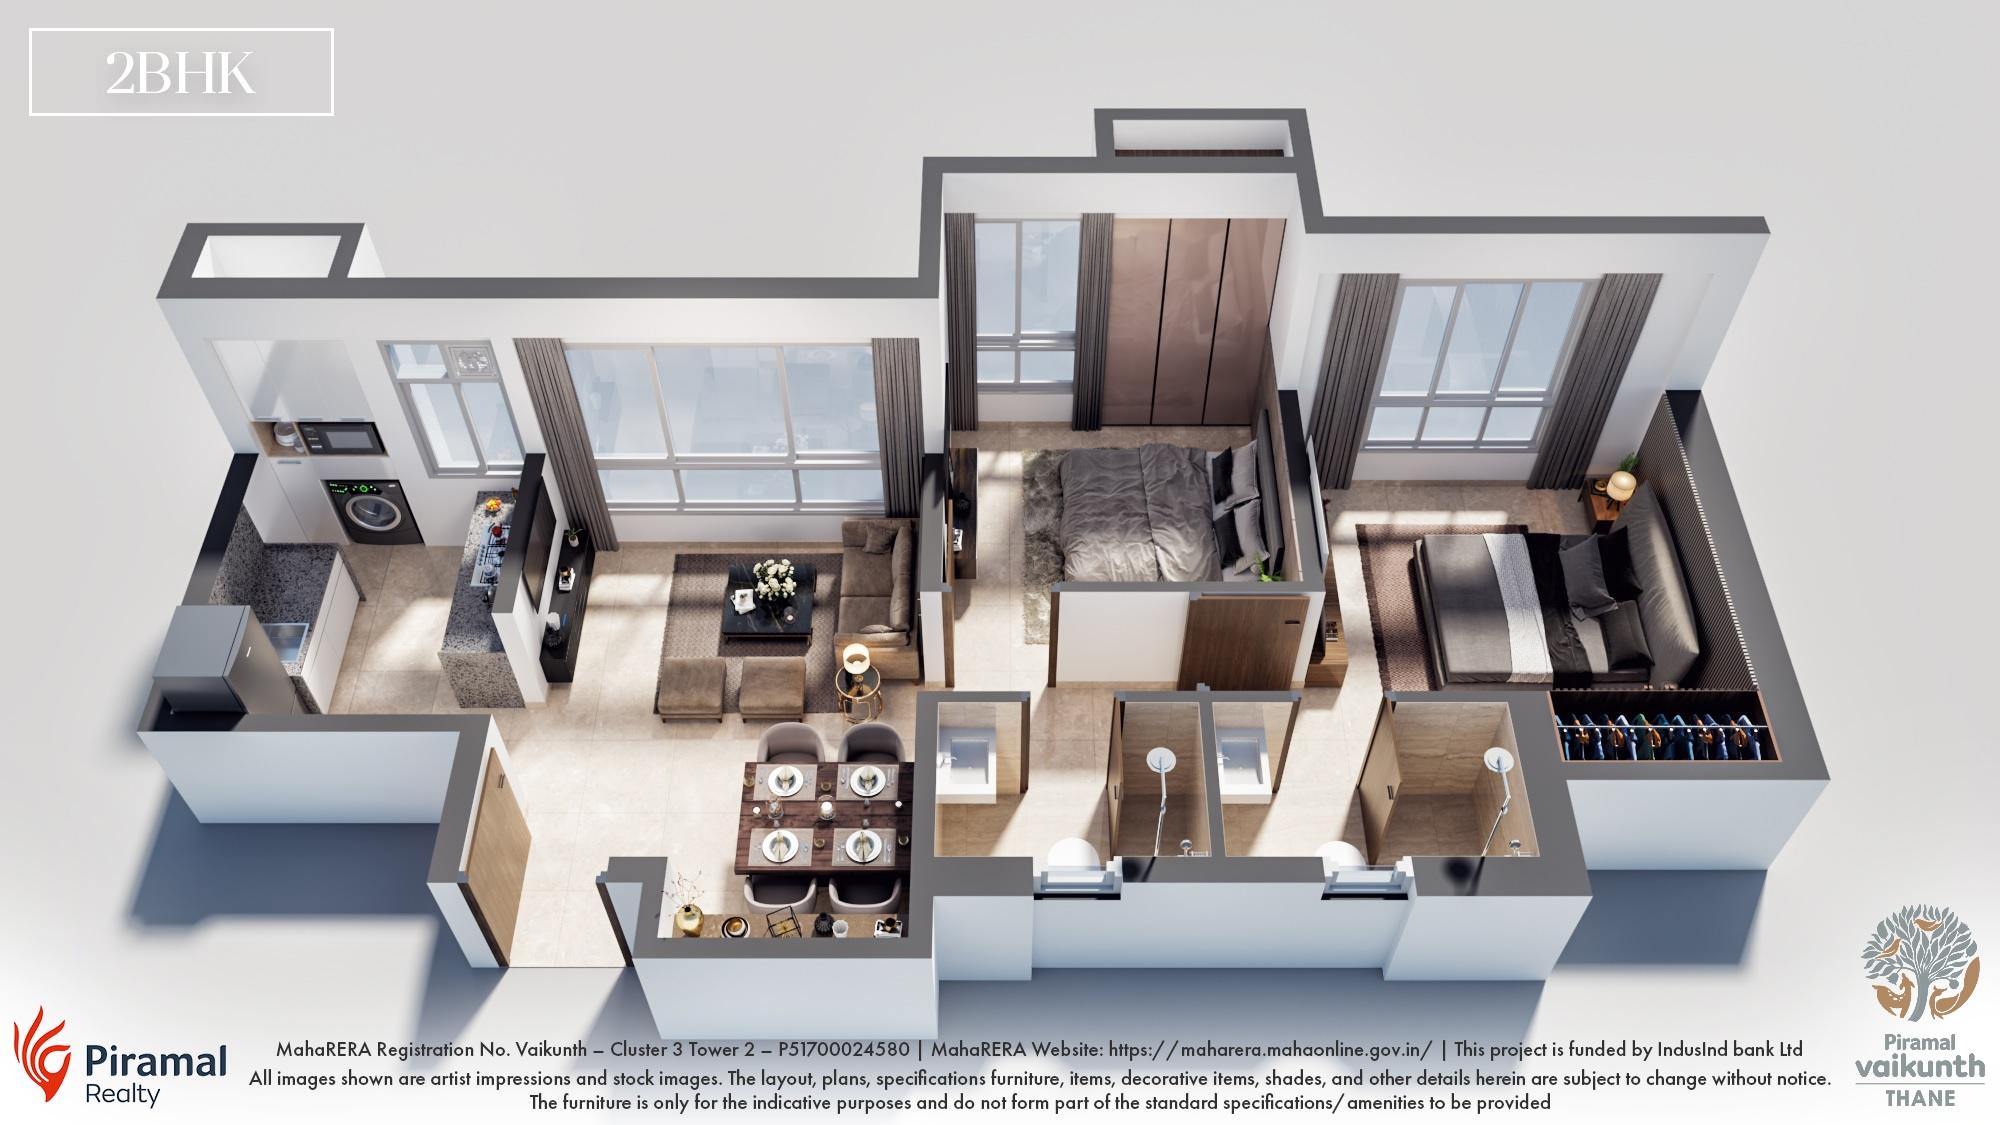 piramal vaikunth a class homes series 2 apartment 2bhk 501sqft61